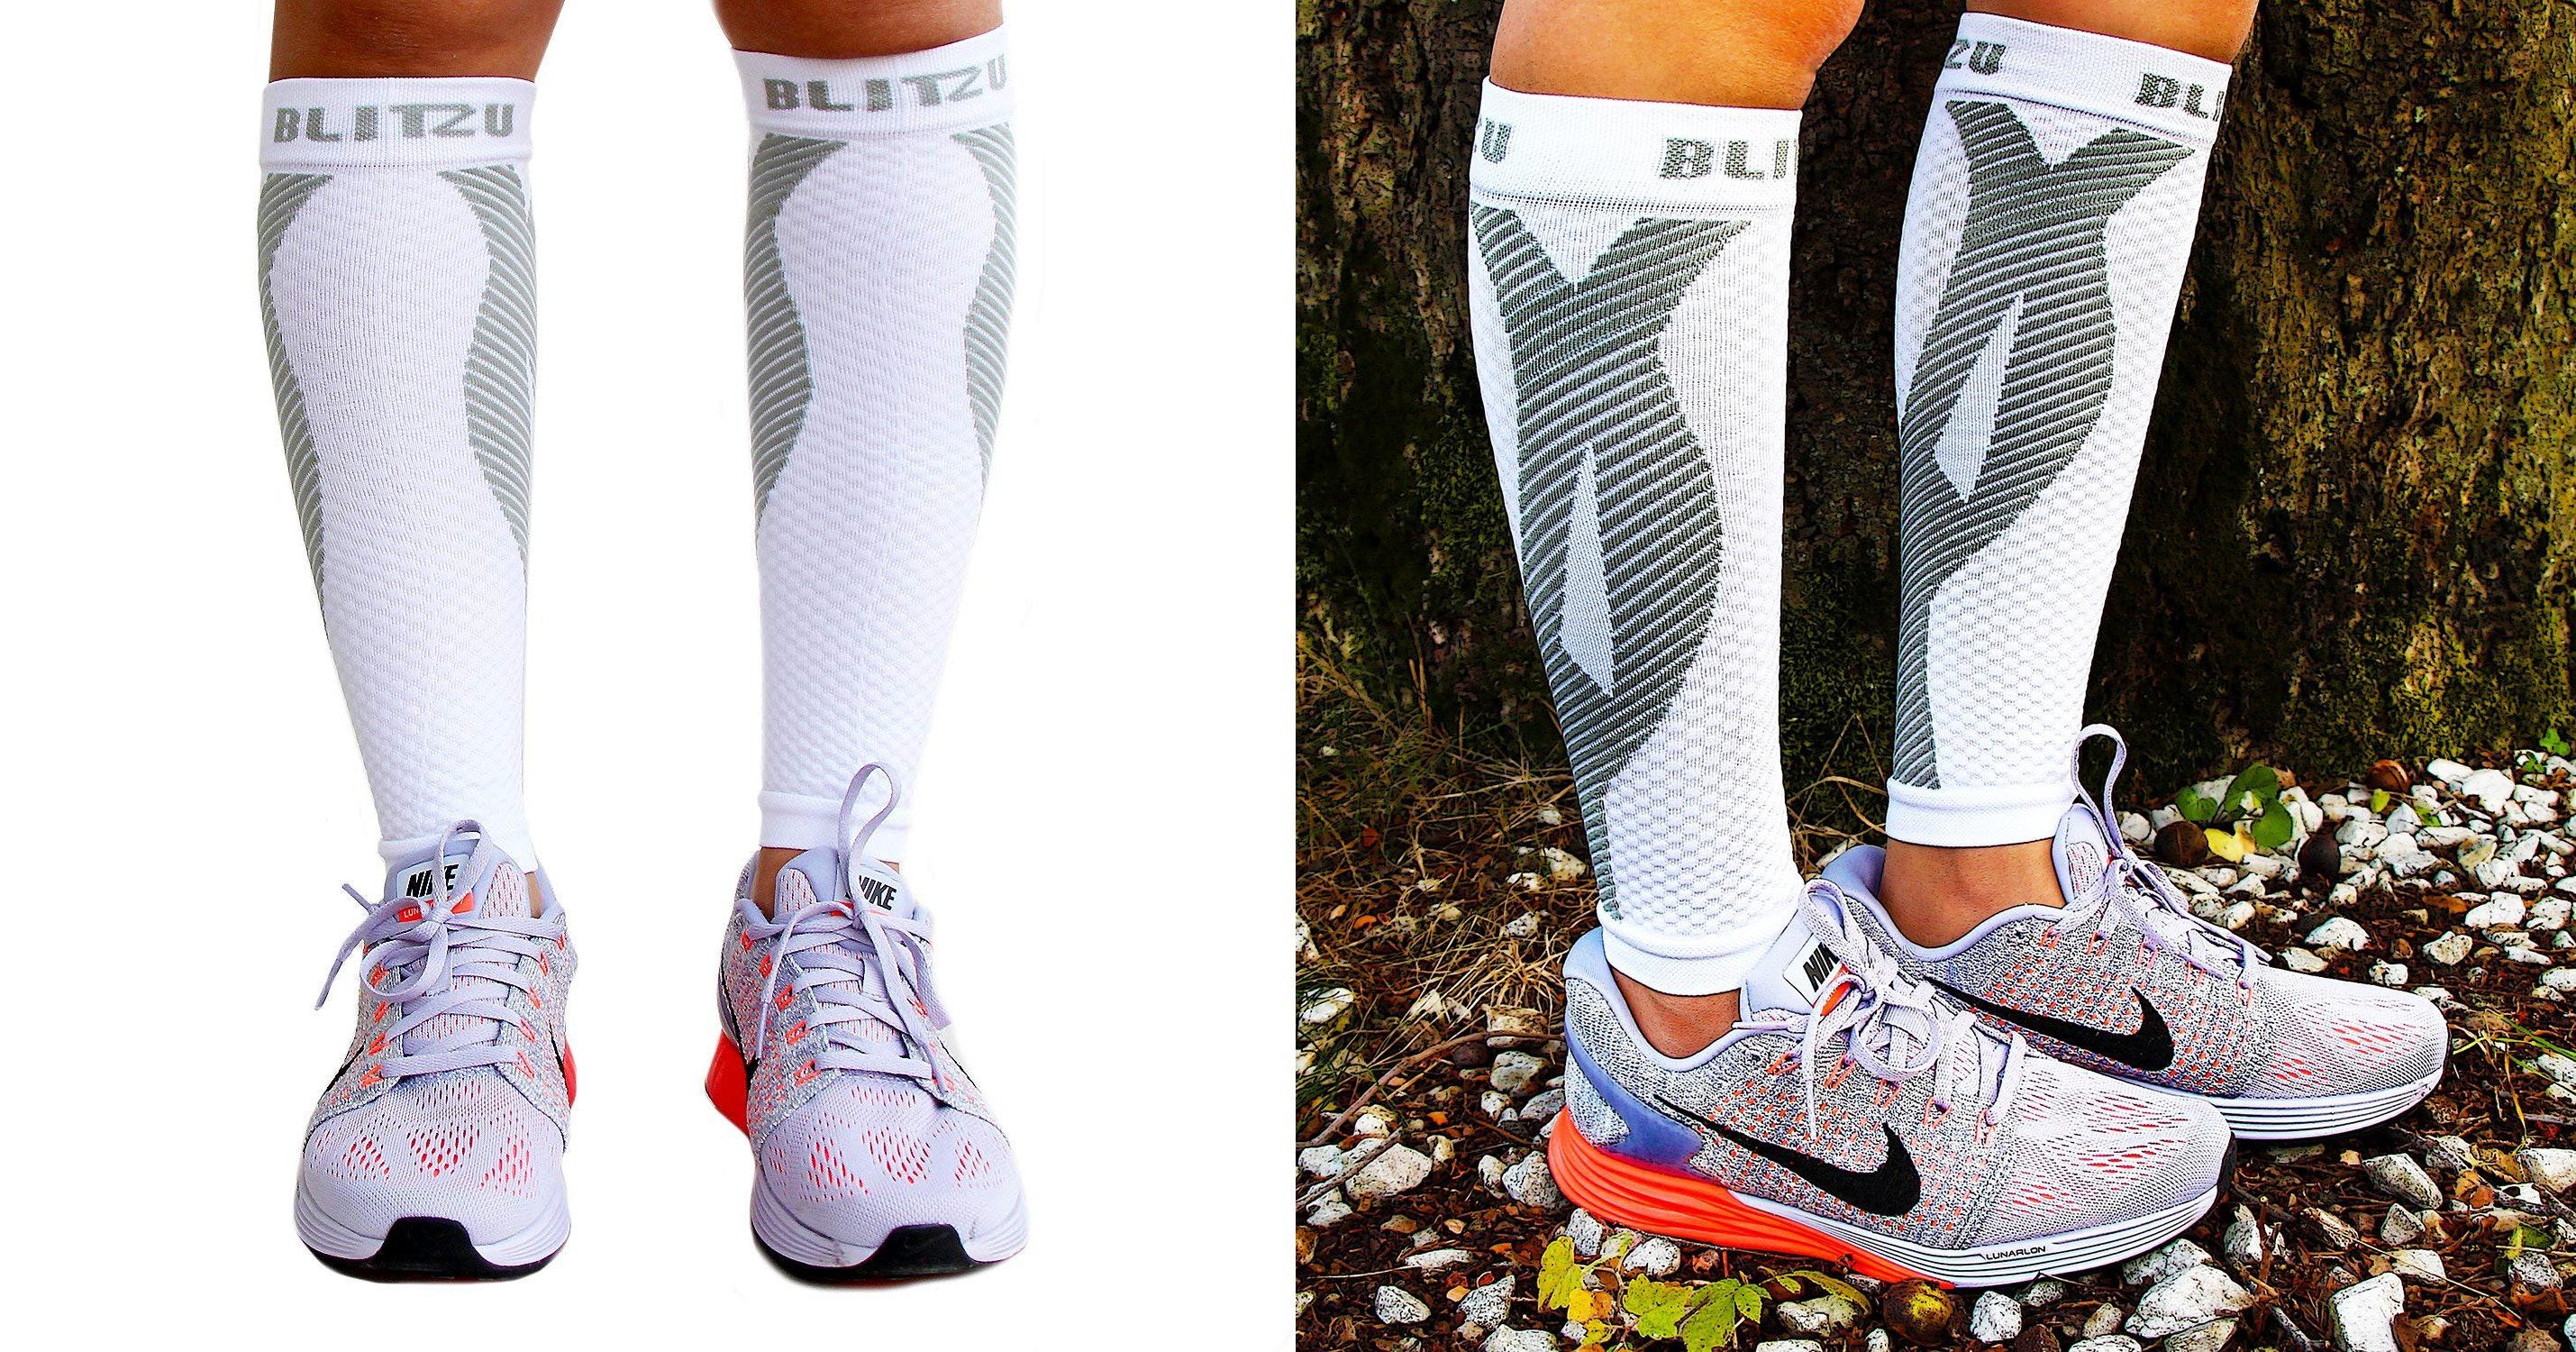 dbceeca418 The 3 Best Compression Socks For Shin Splints